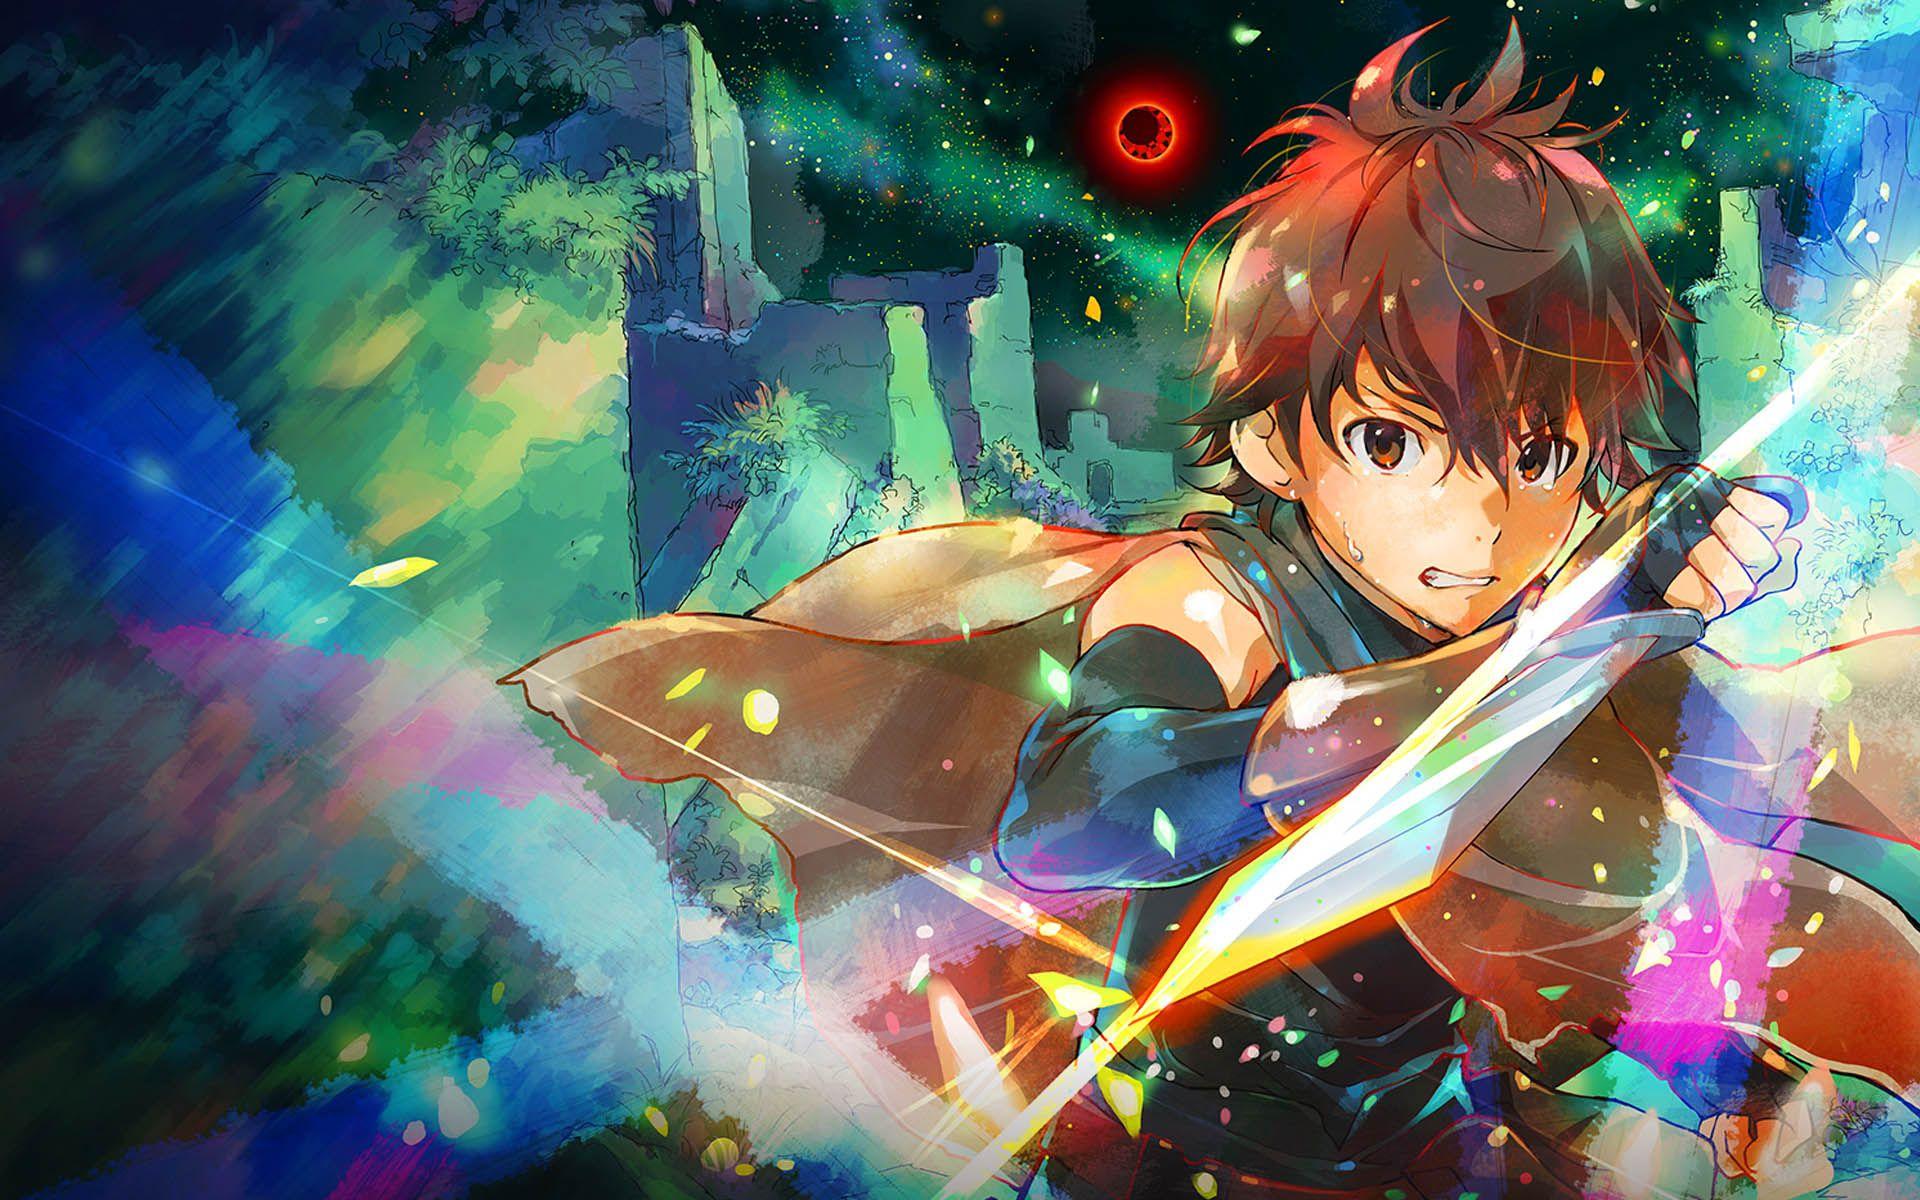 Hai To Gensou No Grimgar Hd Wallpaper Hd Wallpapers Tops Anime Music Anime Anime Dvd